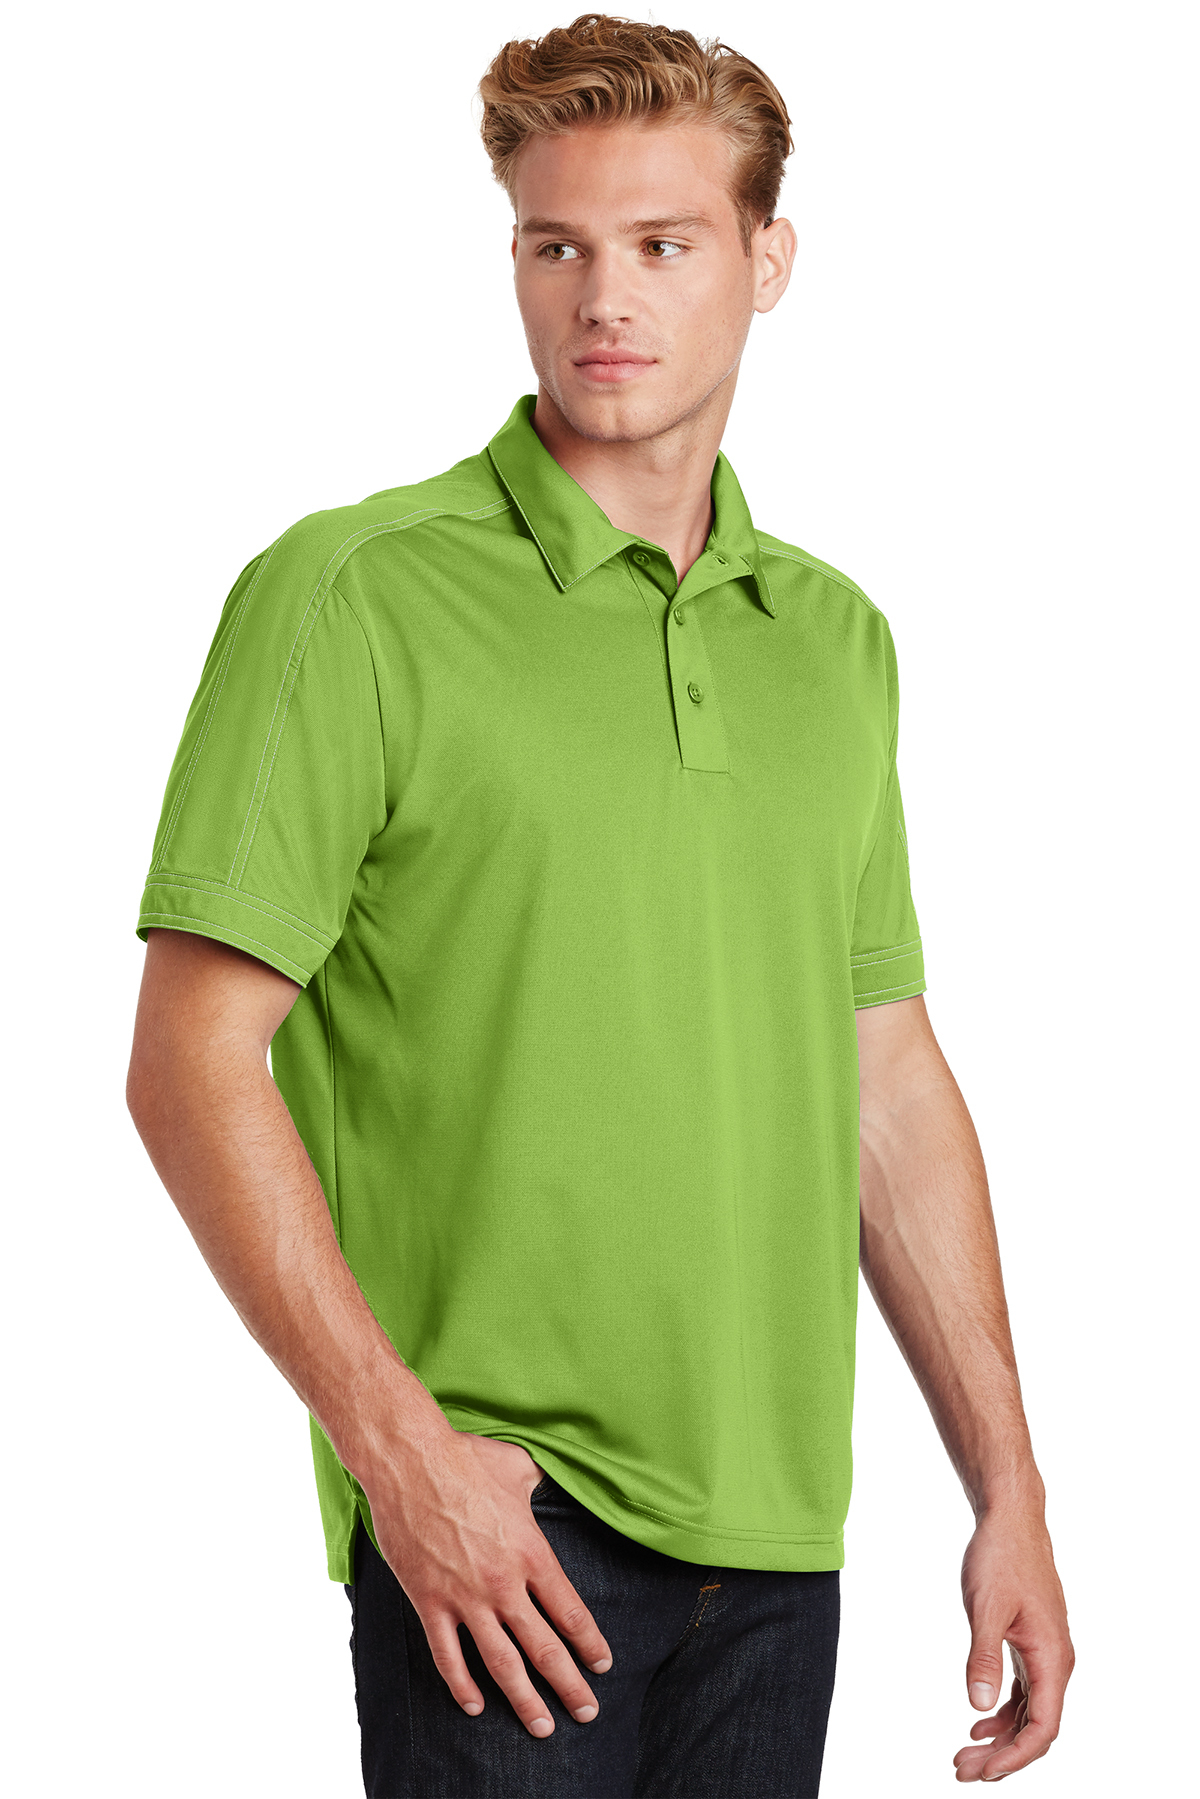 Contrast Stitch Micropique Sport-Wick Performance Polo Shirt Sport-Tek ST659